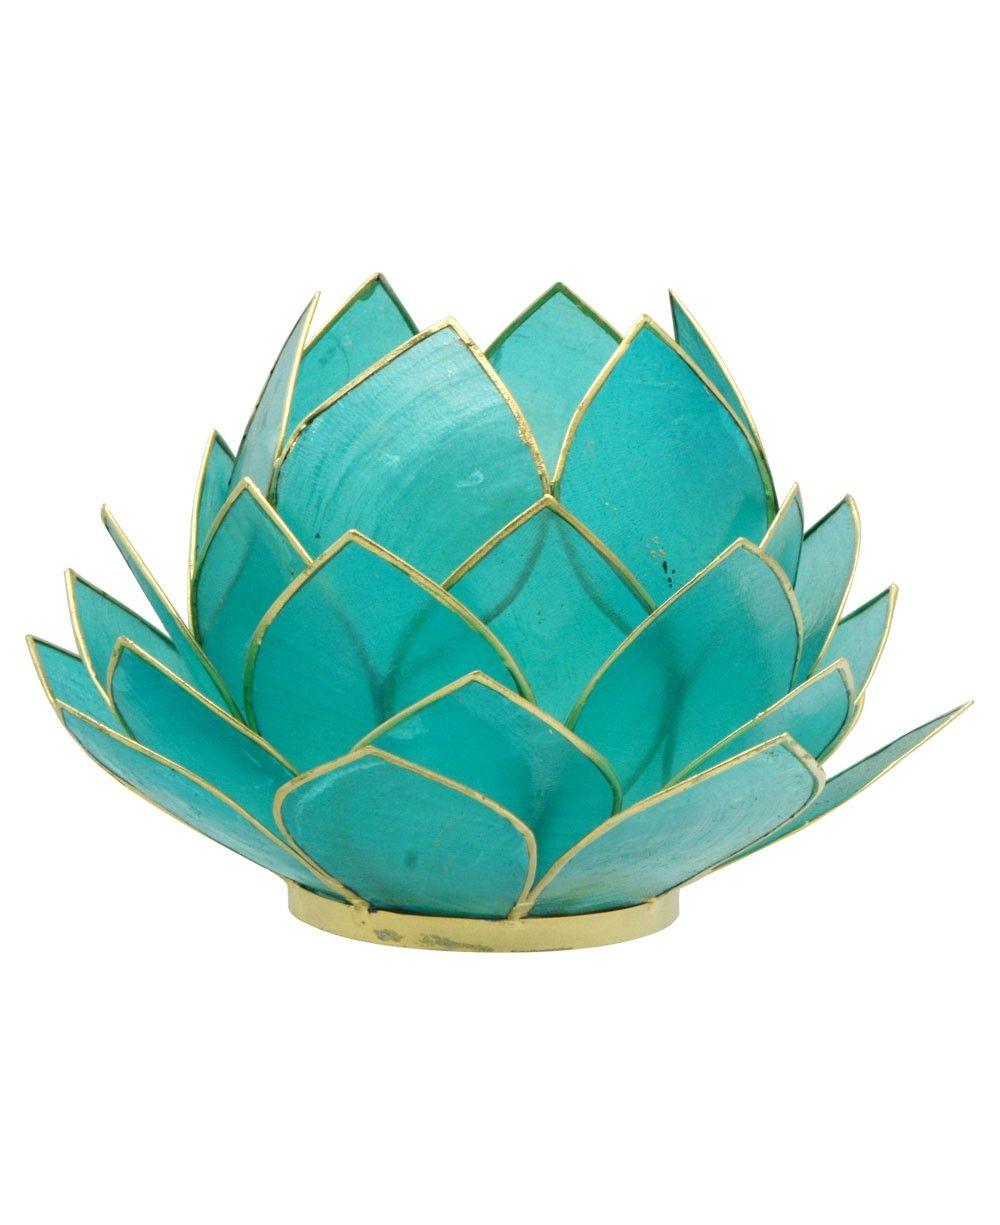 Turquoise Tealight Candle Holder Lotus Tea Light Holder Capiz